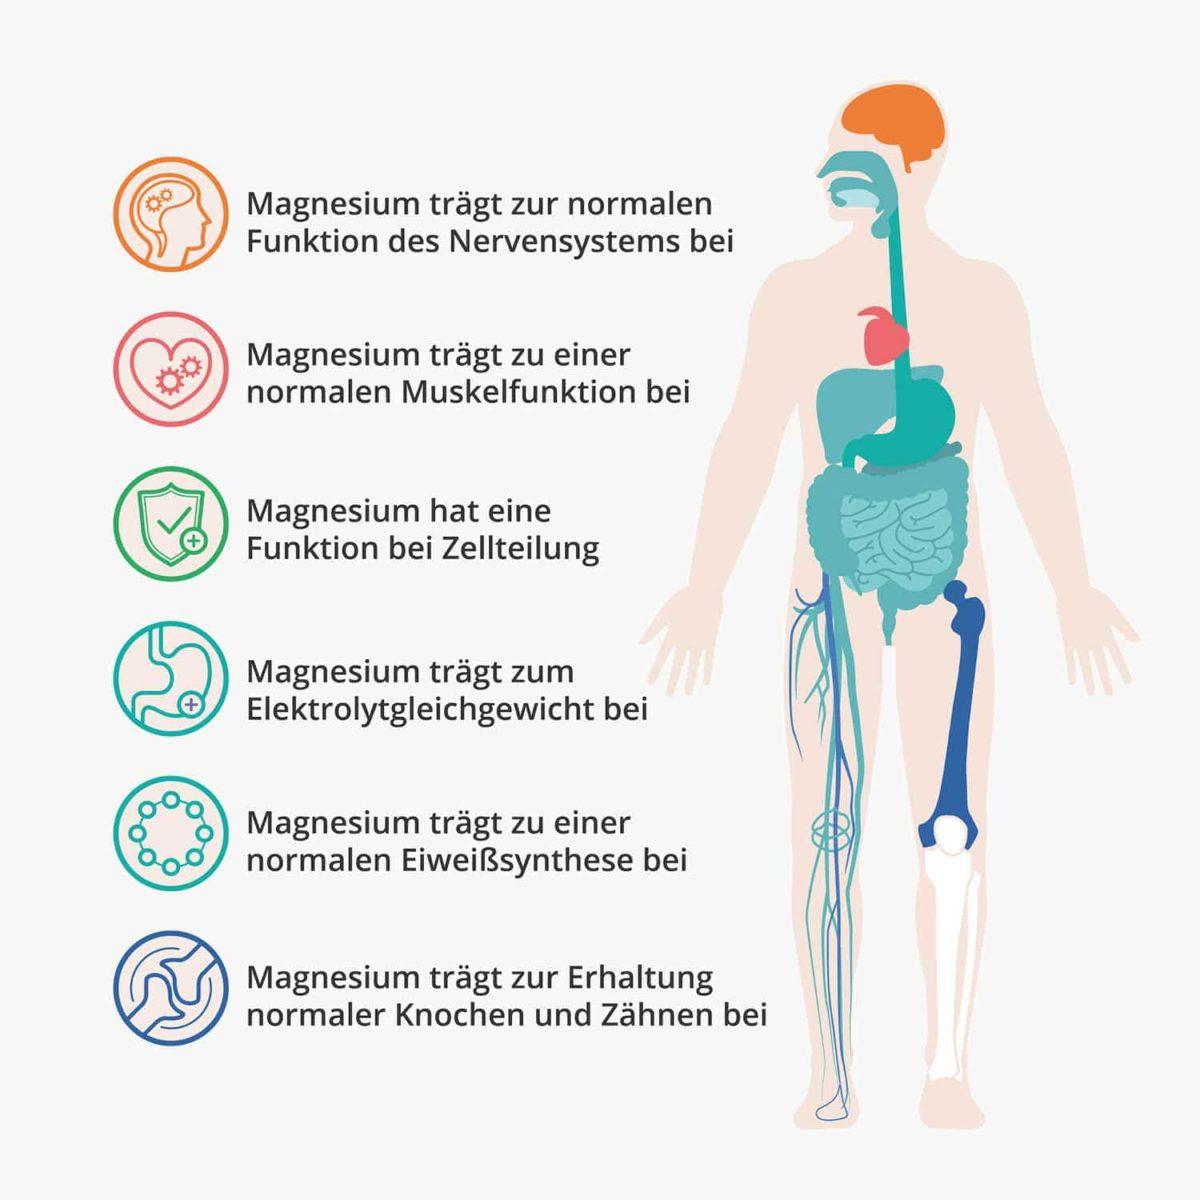 Casida Magnesiumcitrat Kapseln Vital – 120 Stk. 14362474 PZN Apotheke Muskelkater Muskelkrampf Sport3